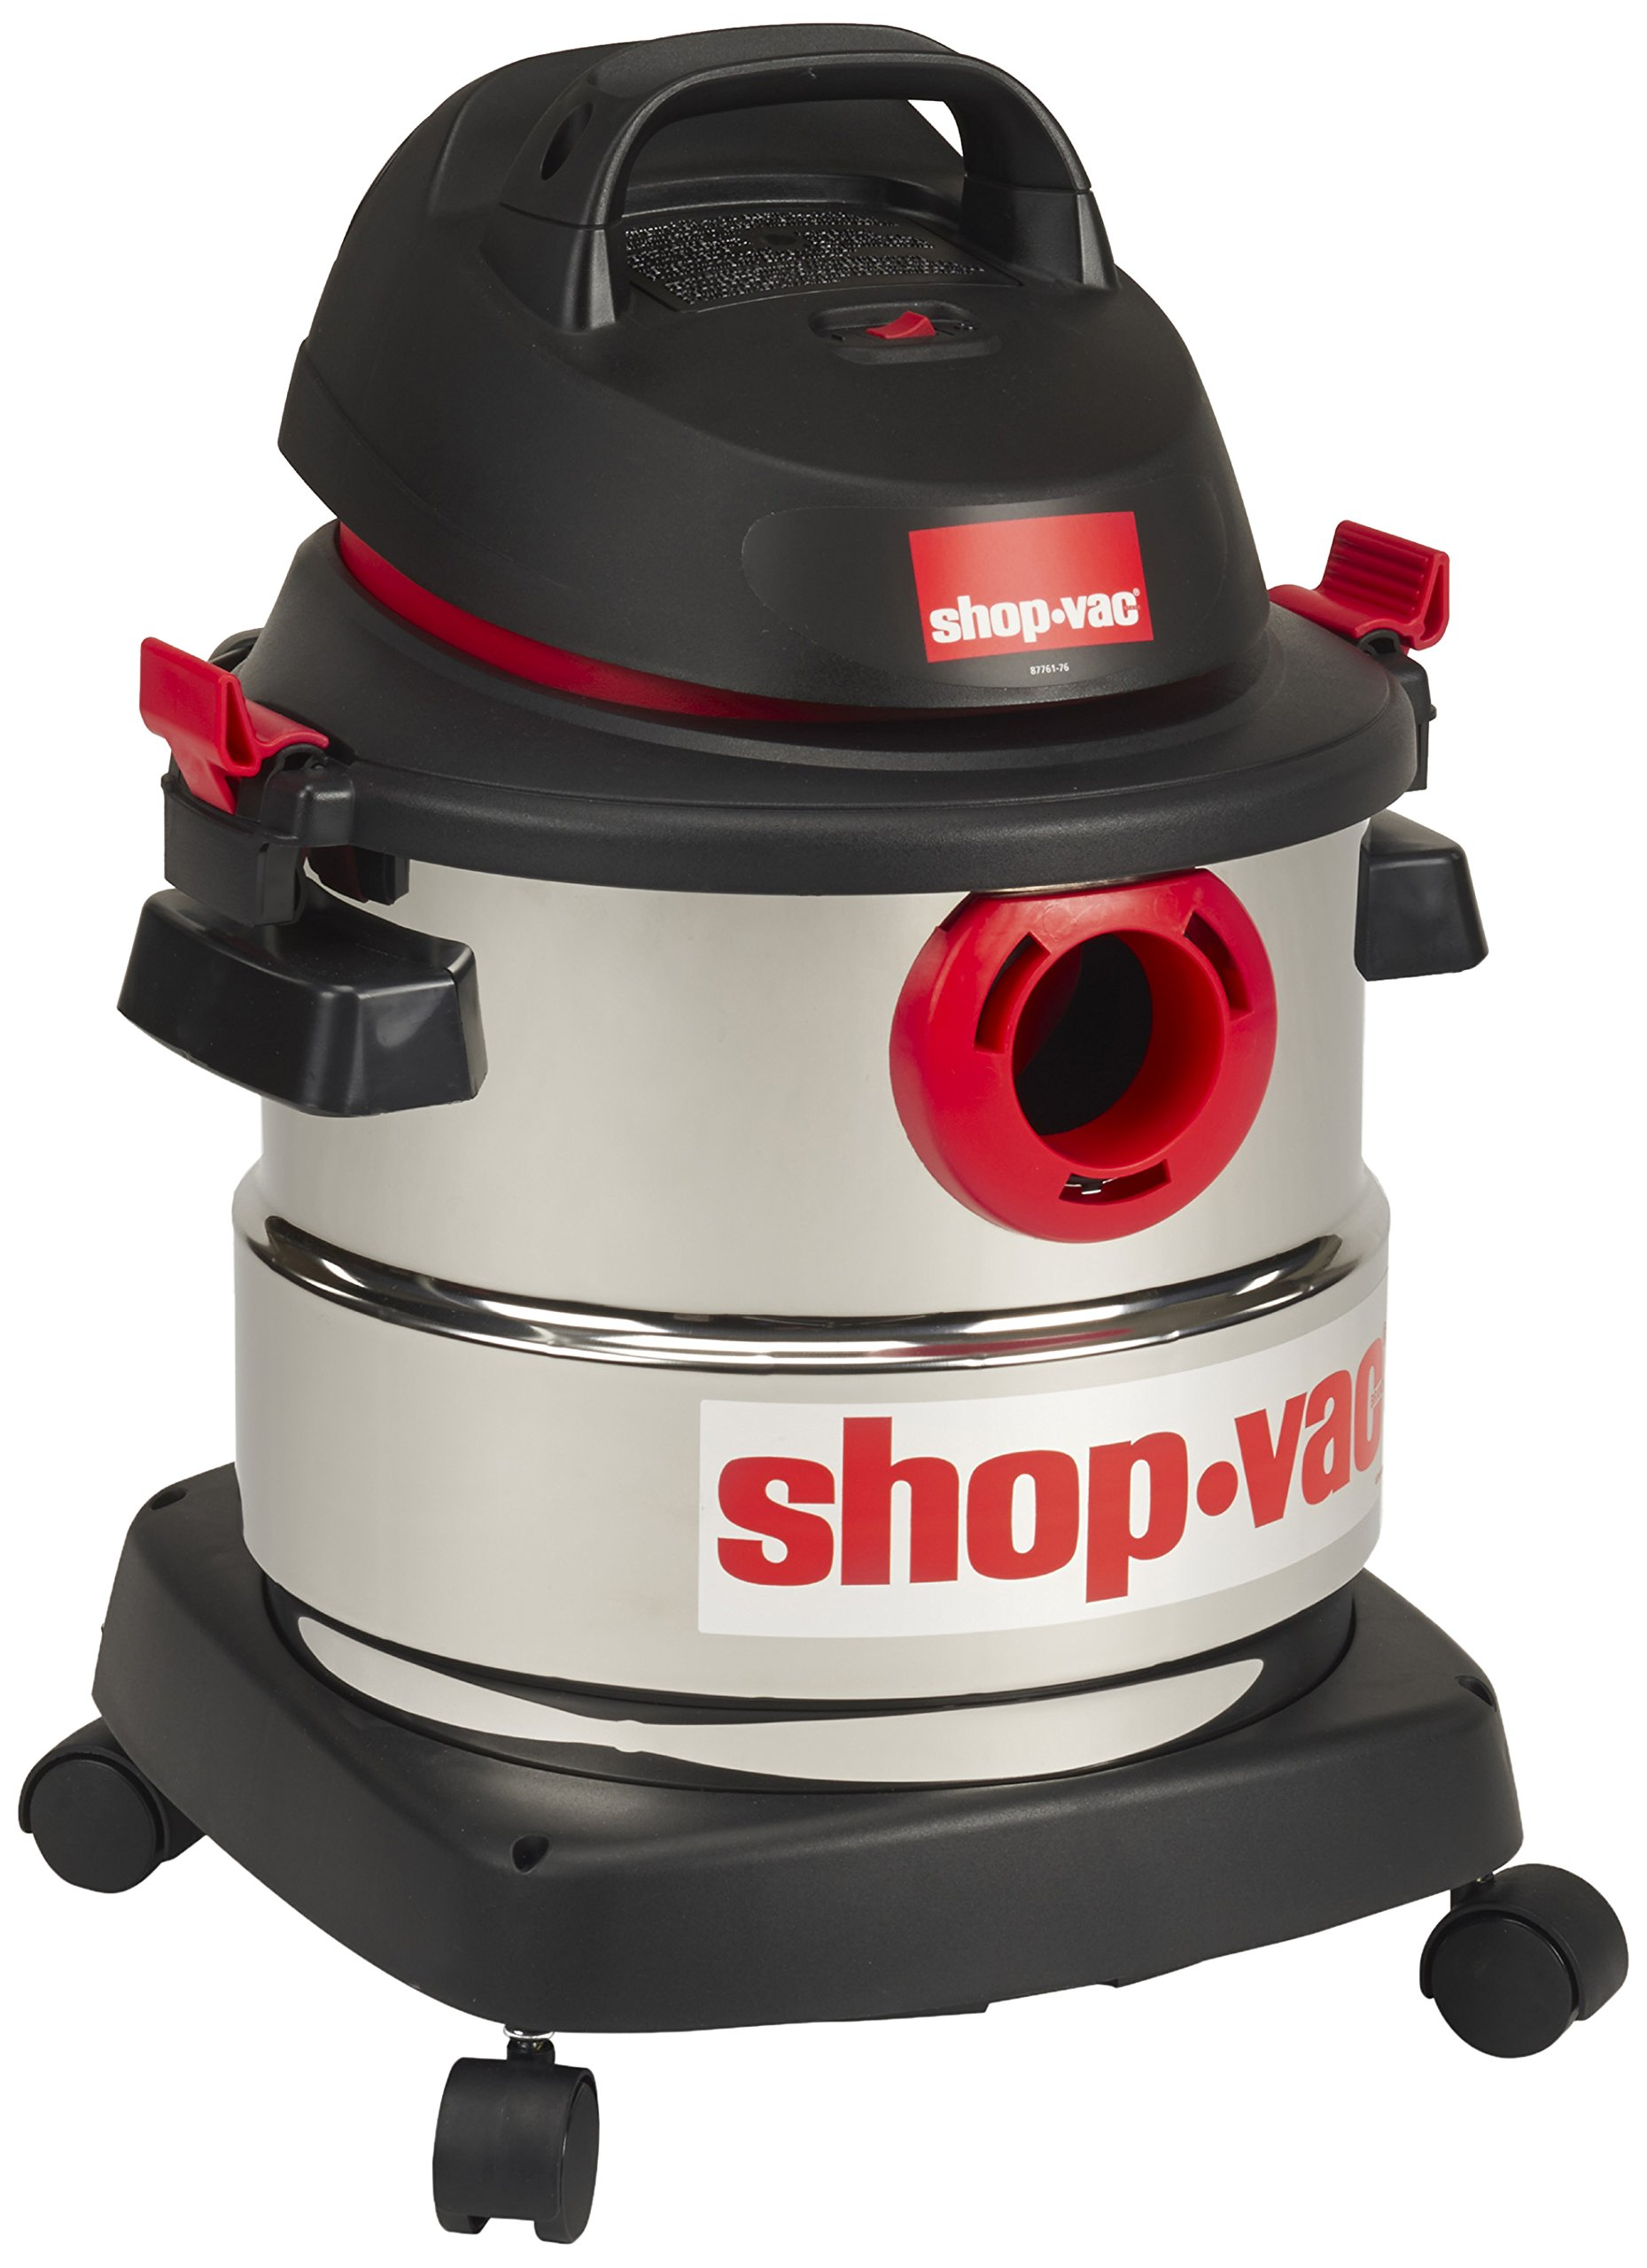 Shop-Vac 5989300 5-Gallon 4.5 Peak HP Stainless Steel Wet Dry Vacuum by Shop-Vac